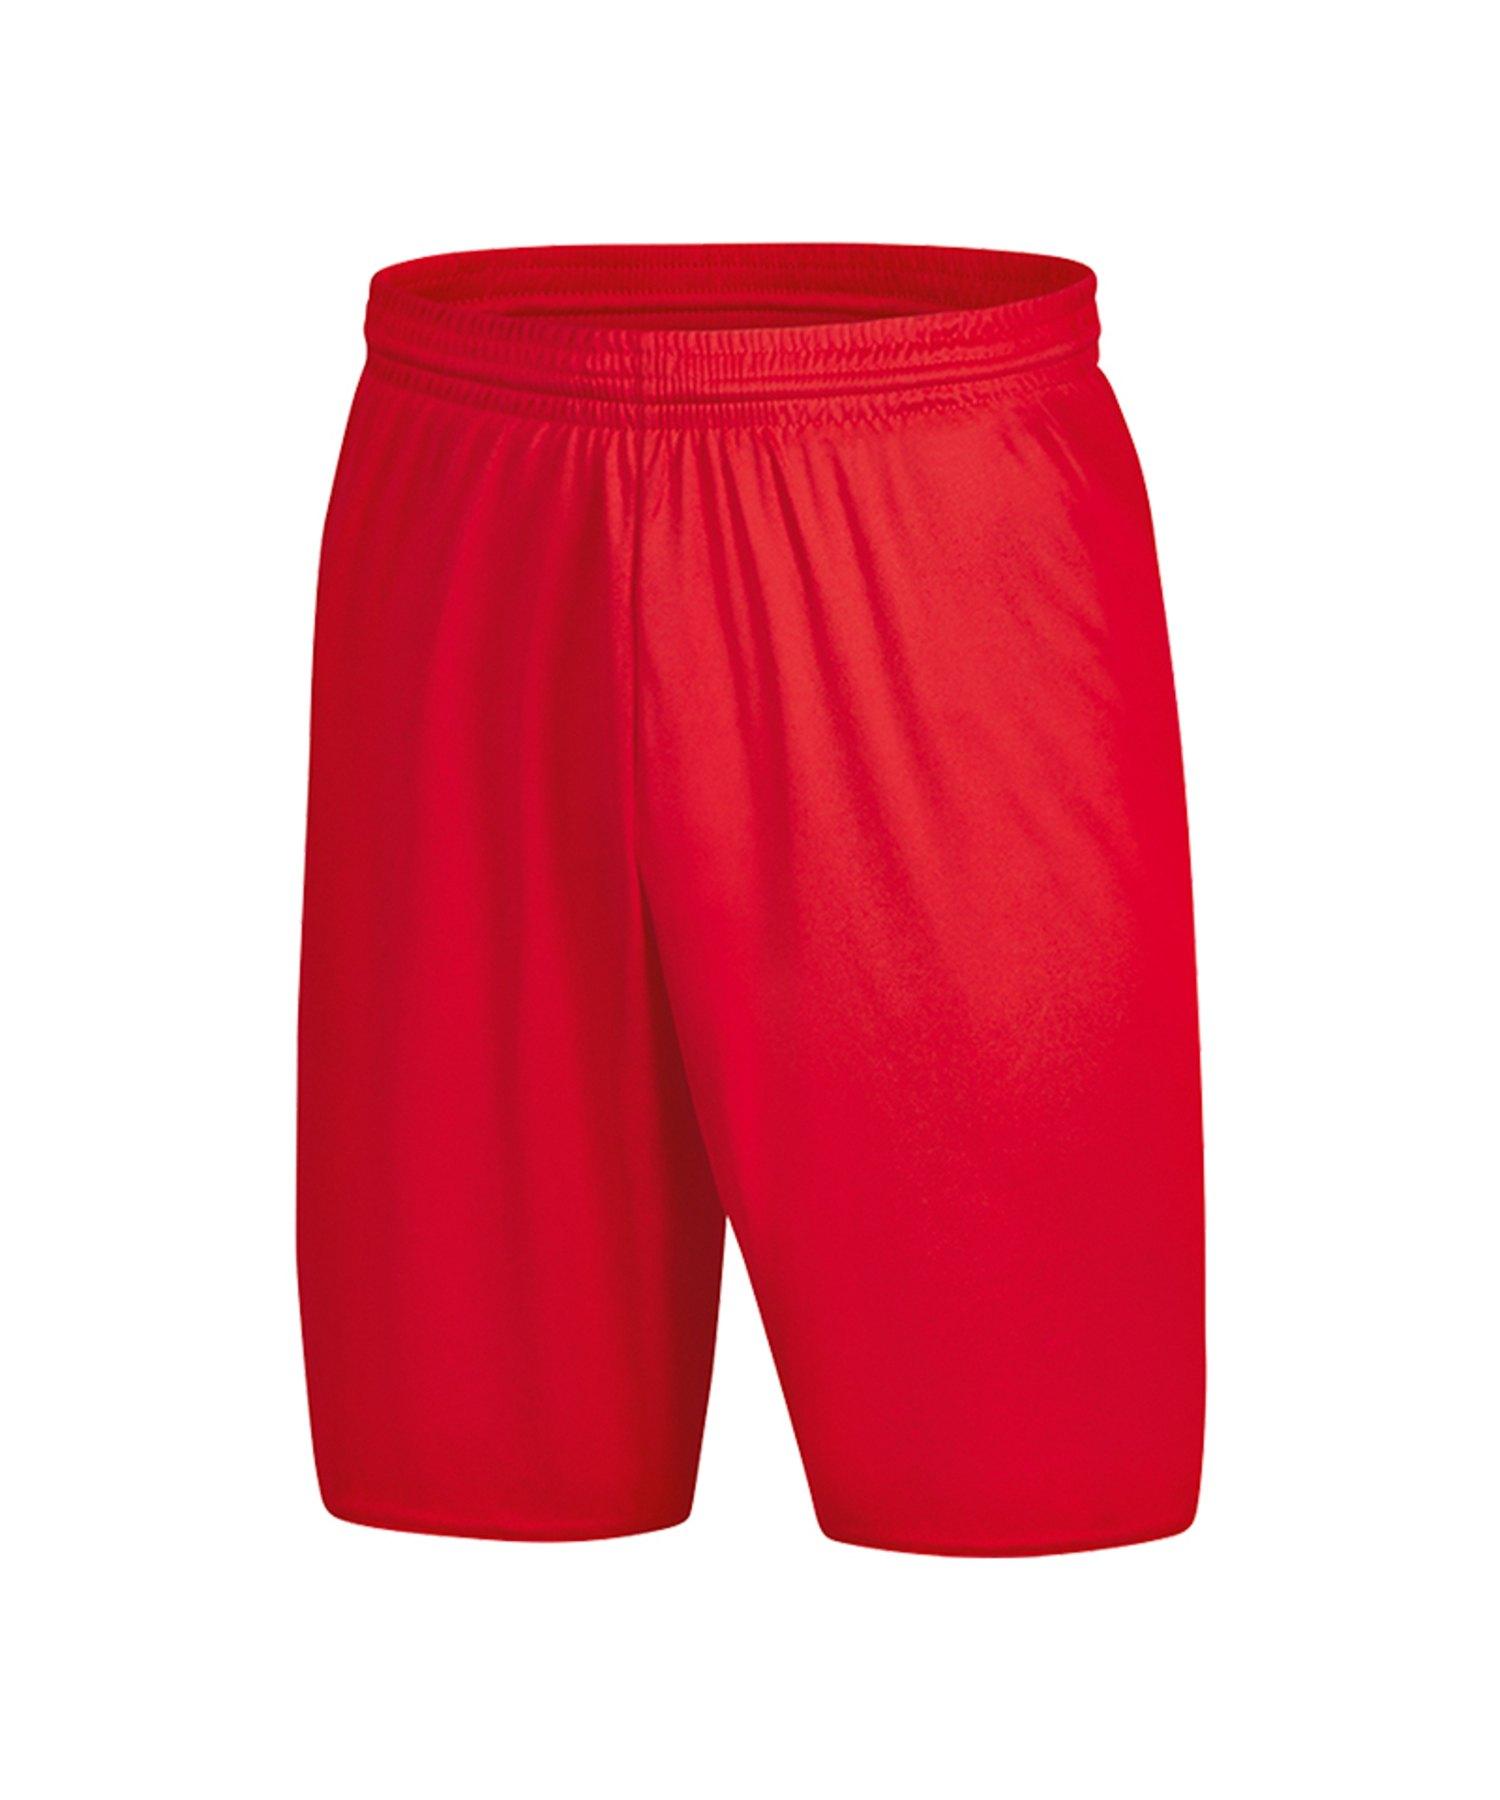 Jako Palermo 2.0 Short Hose kurz Rot F01 - Rot